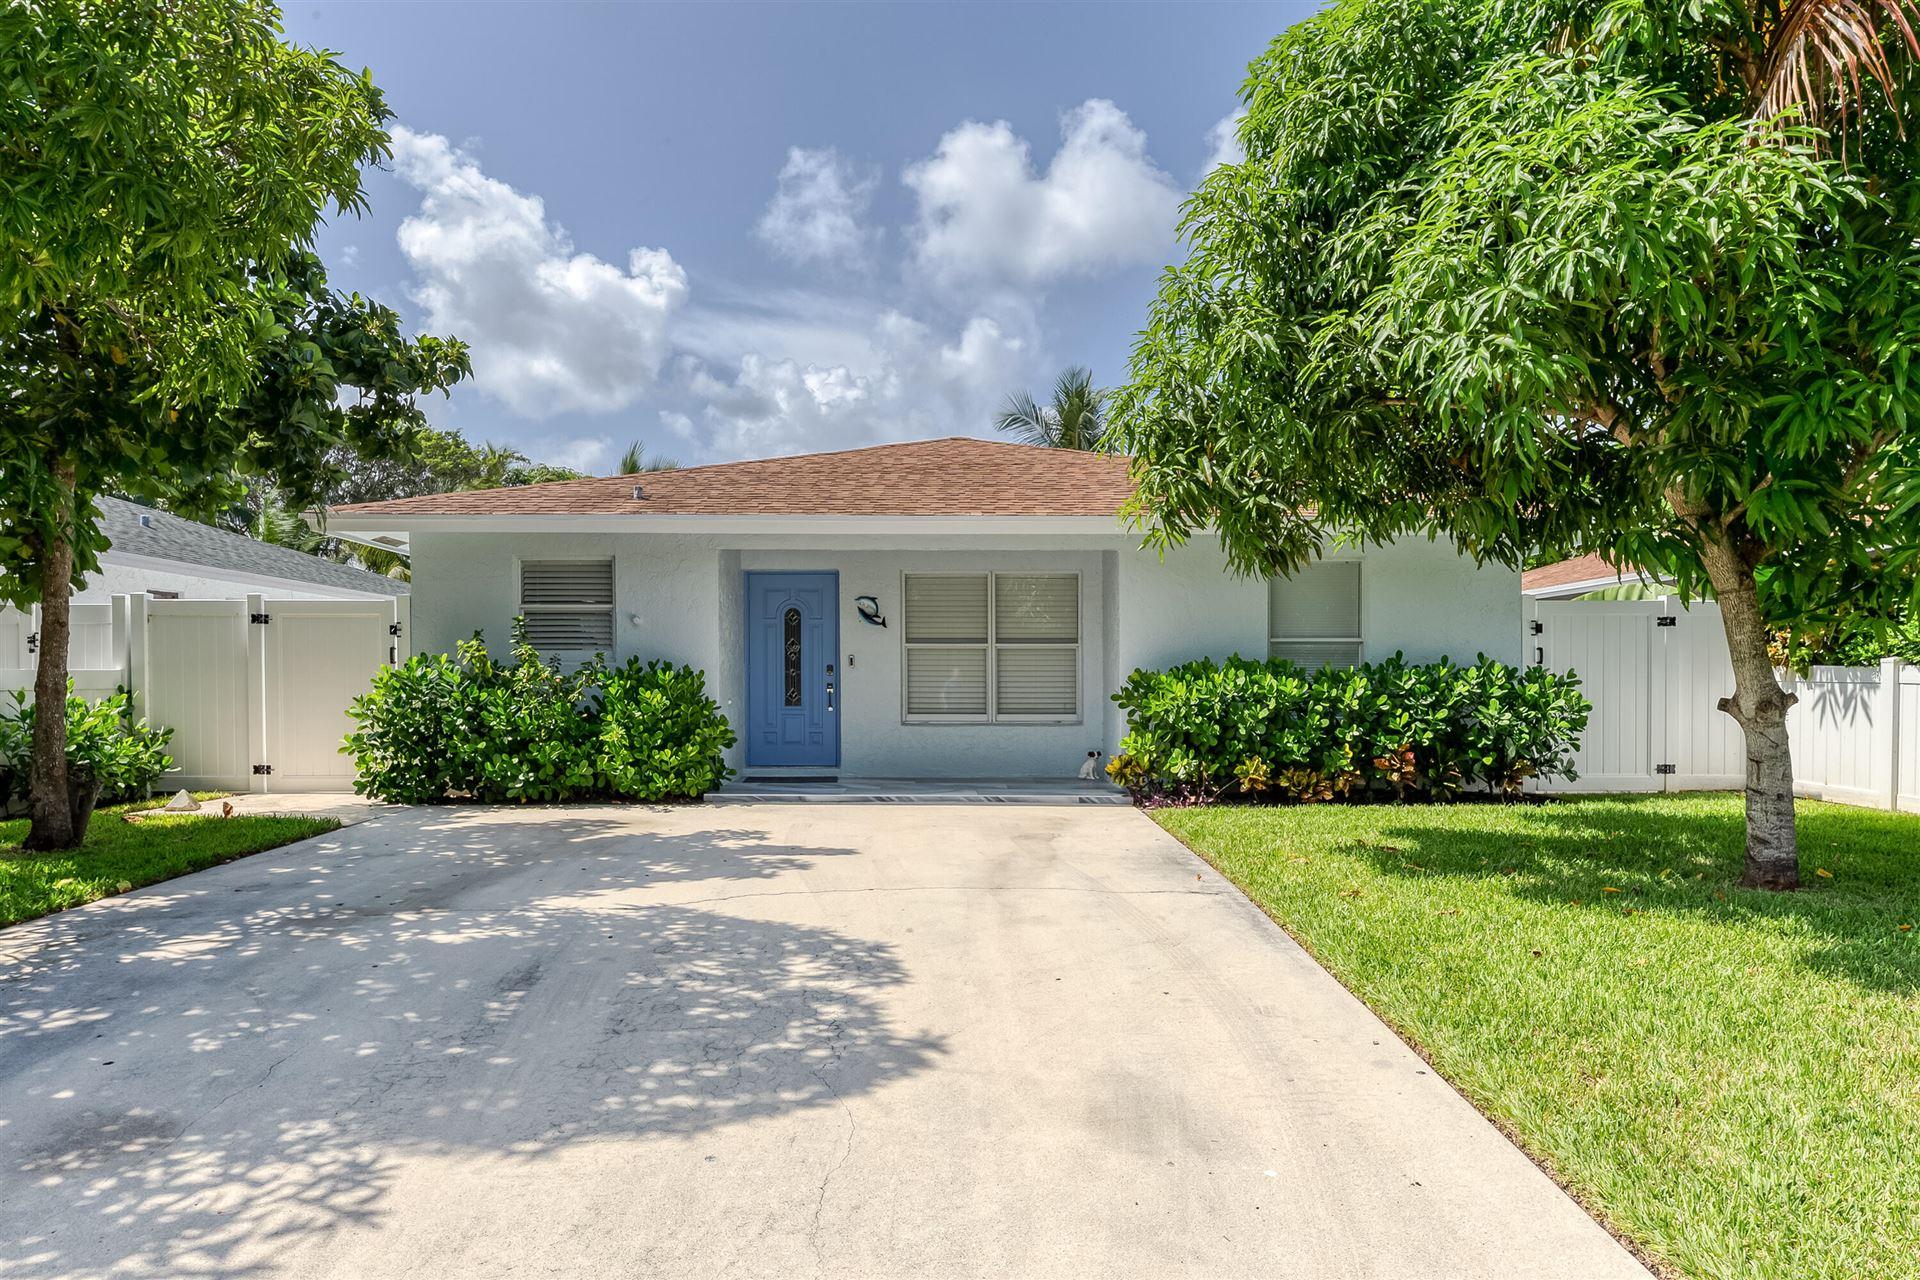 312 NW 1st Avenue, Delray Beach, FL 33444 - MLS#: RX-10750913